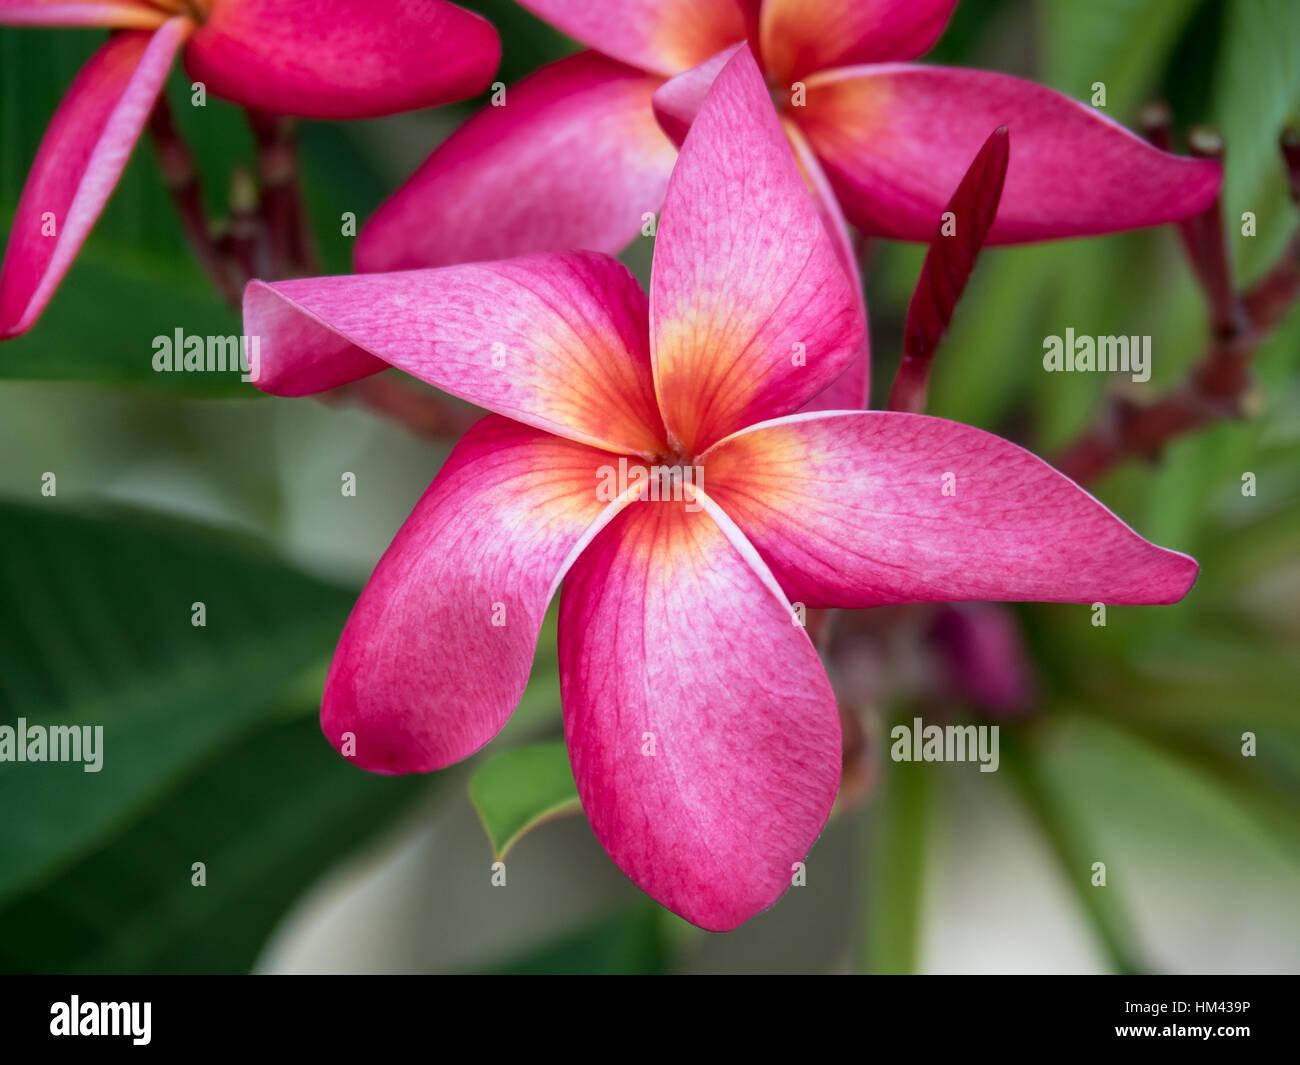 Pink plumeria flower blooming on tree spa flower stock photo pink plumeria flower blooming on tree spa flower mightylinksfo